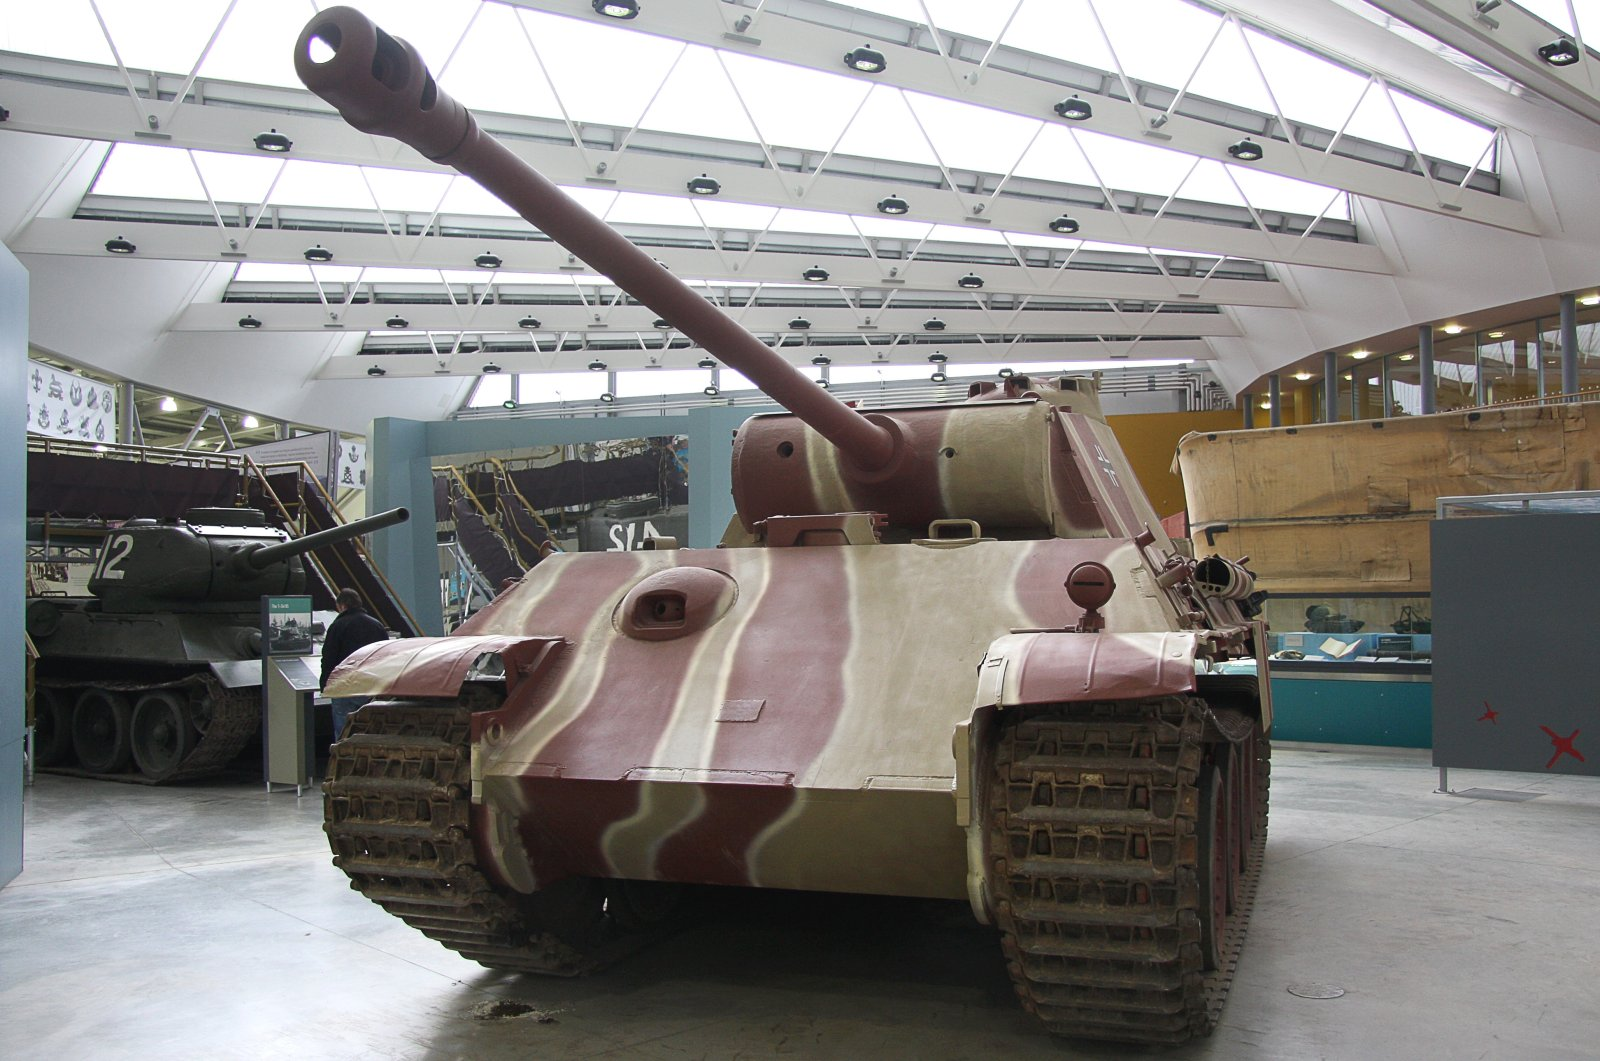 Panzerkampfwagen V Panther tank on display at the Bovington Tank Museum in Bovington, Dorset, U.K., July 7, 2012. (Shutterstock photo)